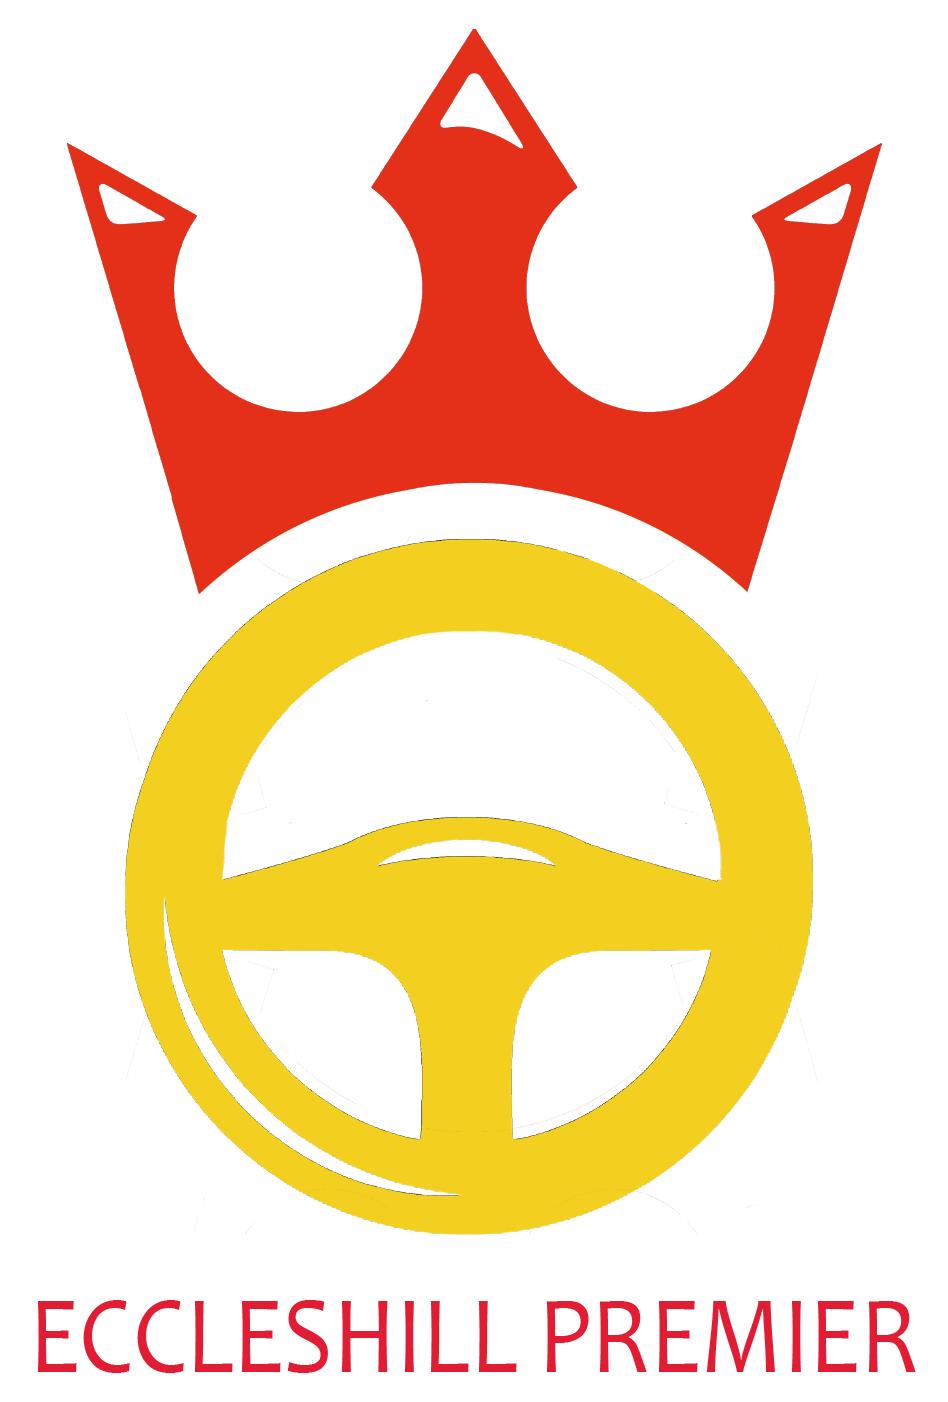 Eccleshill Premier Logo